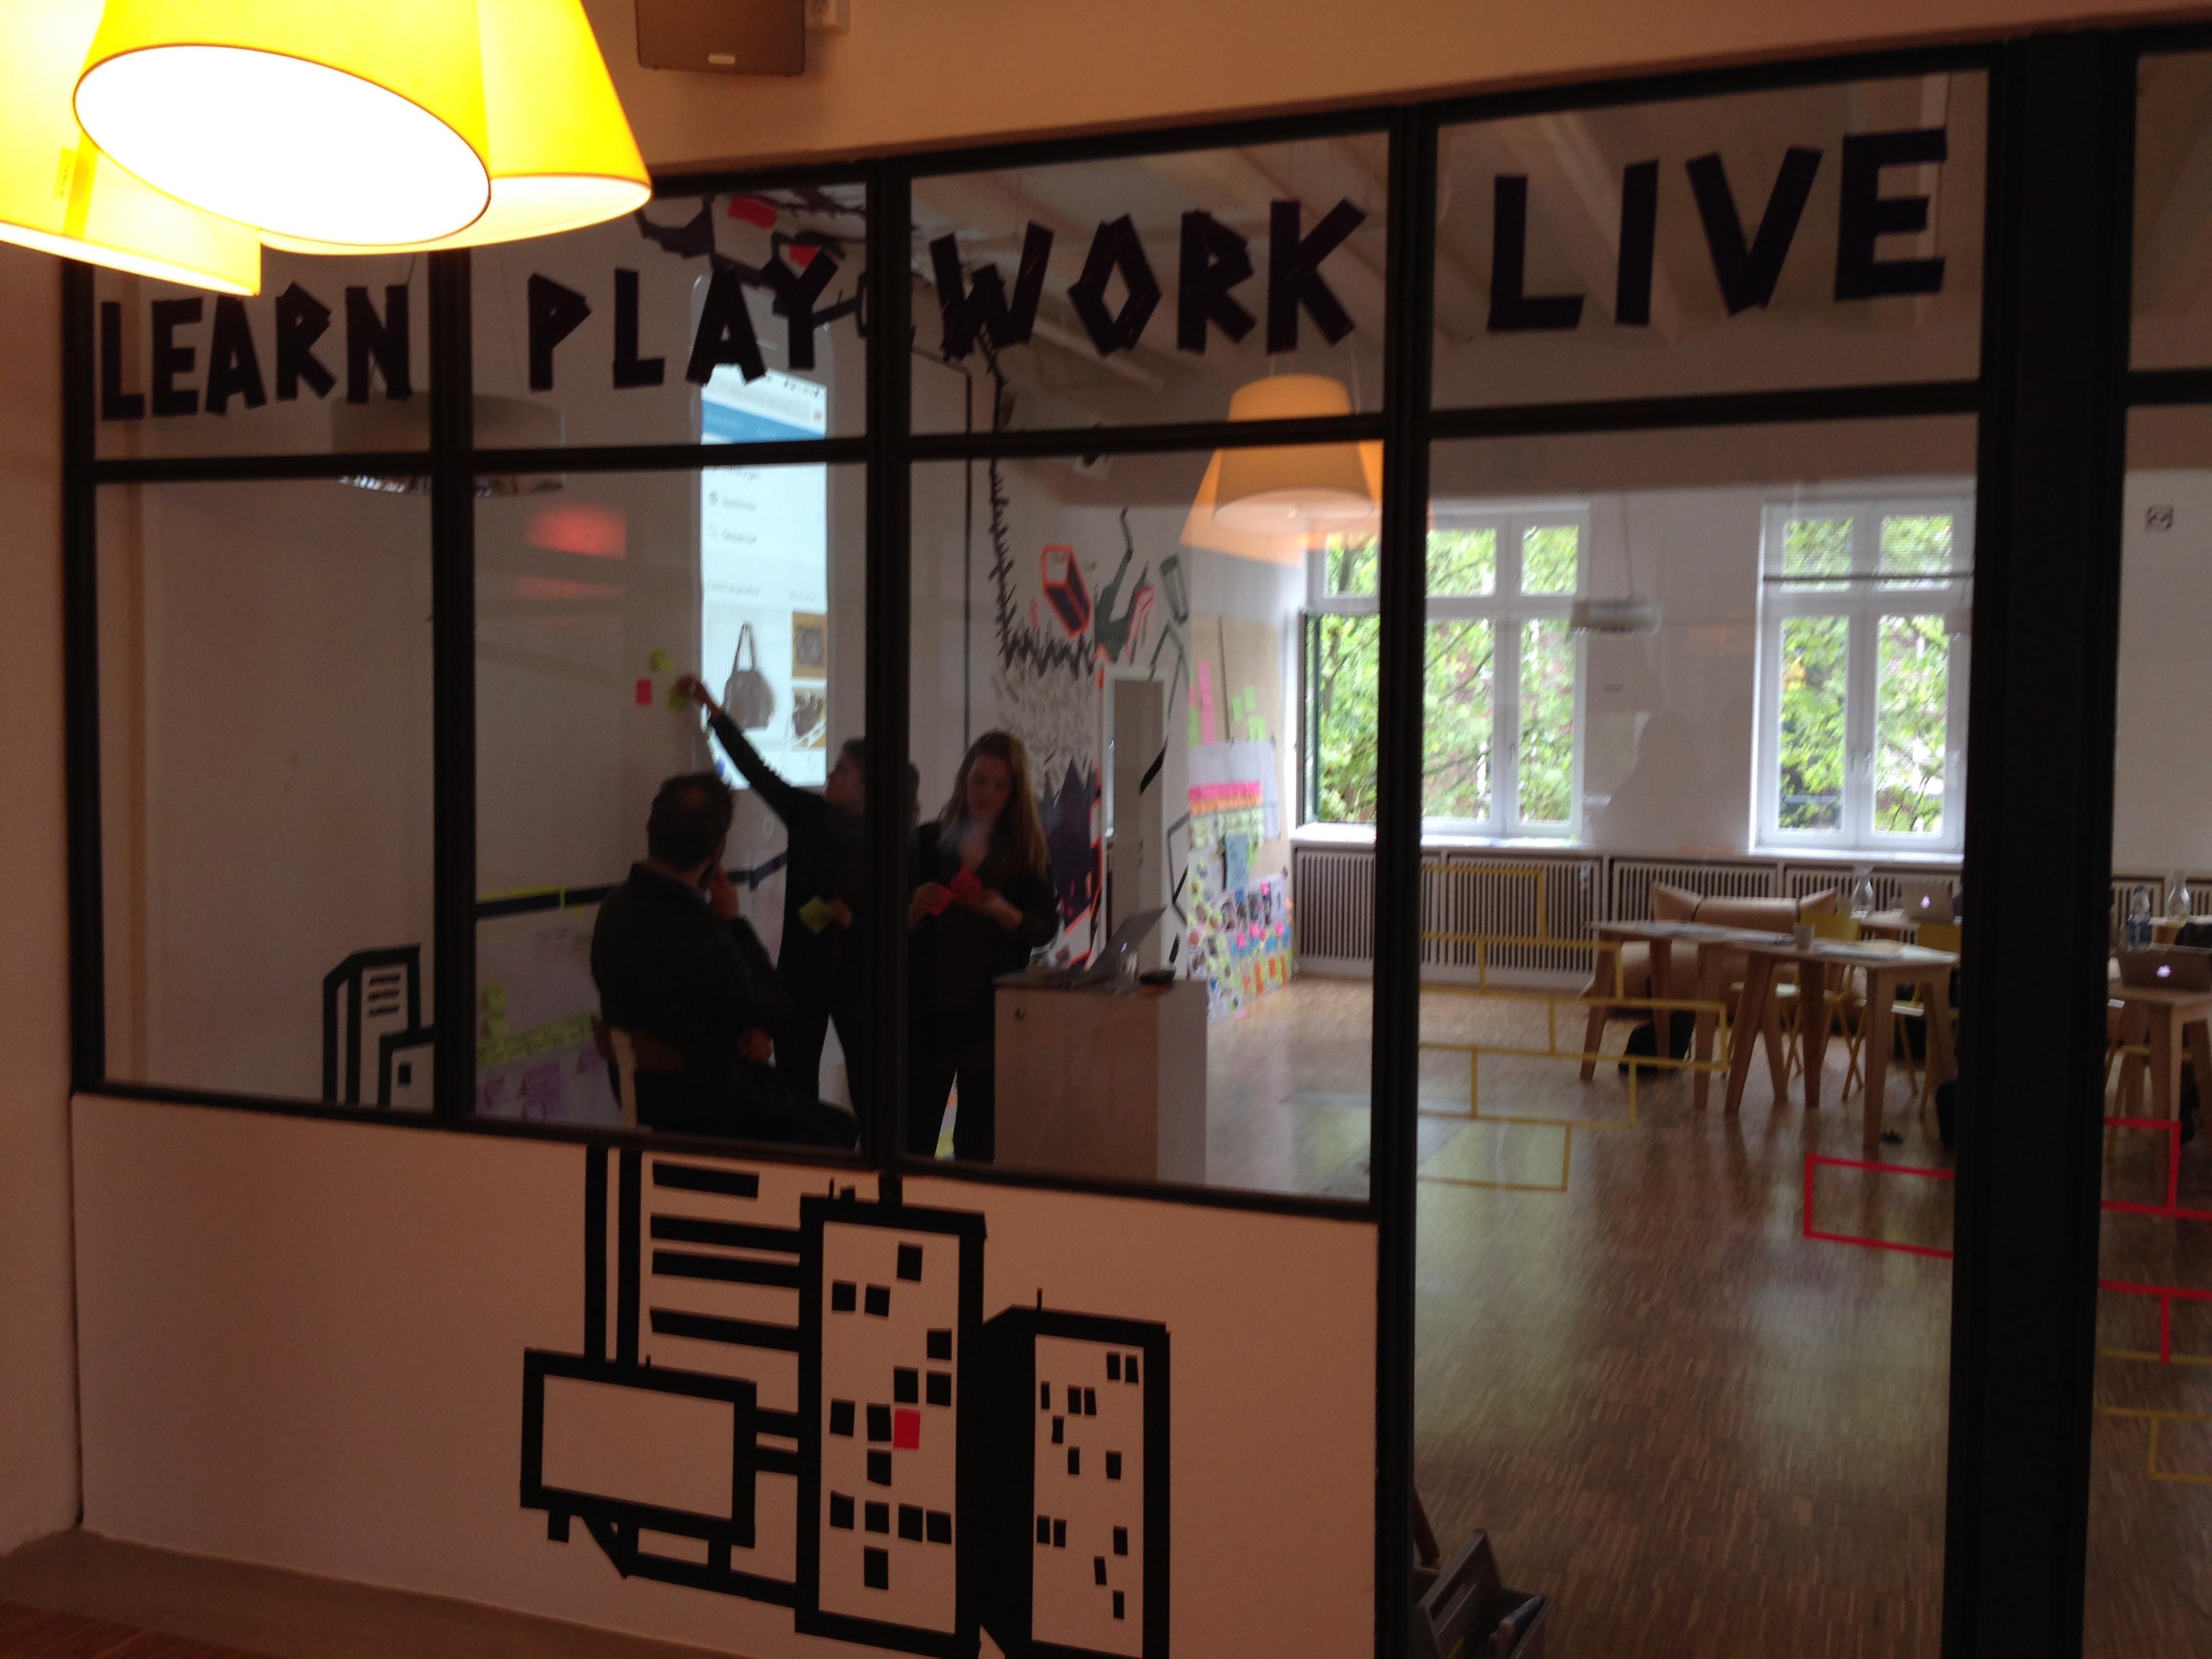 LearnPlayWorkLive - Einblick in die JvM Academy